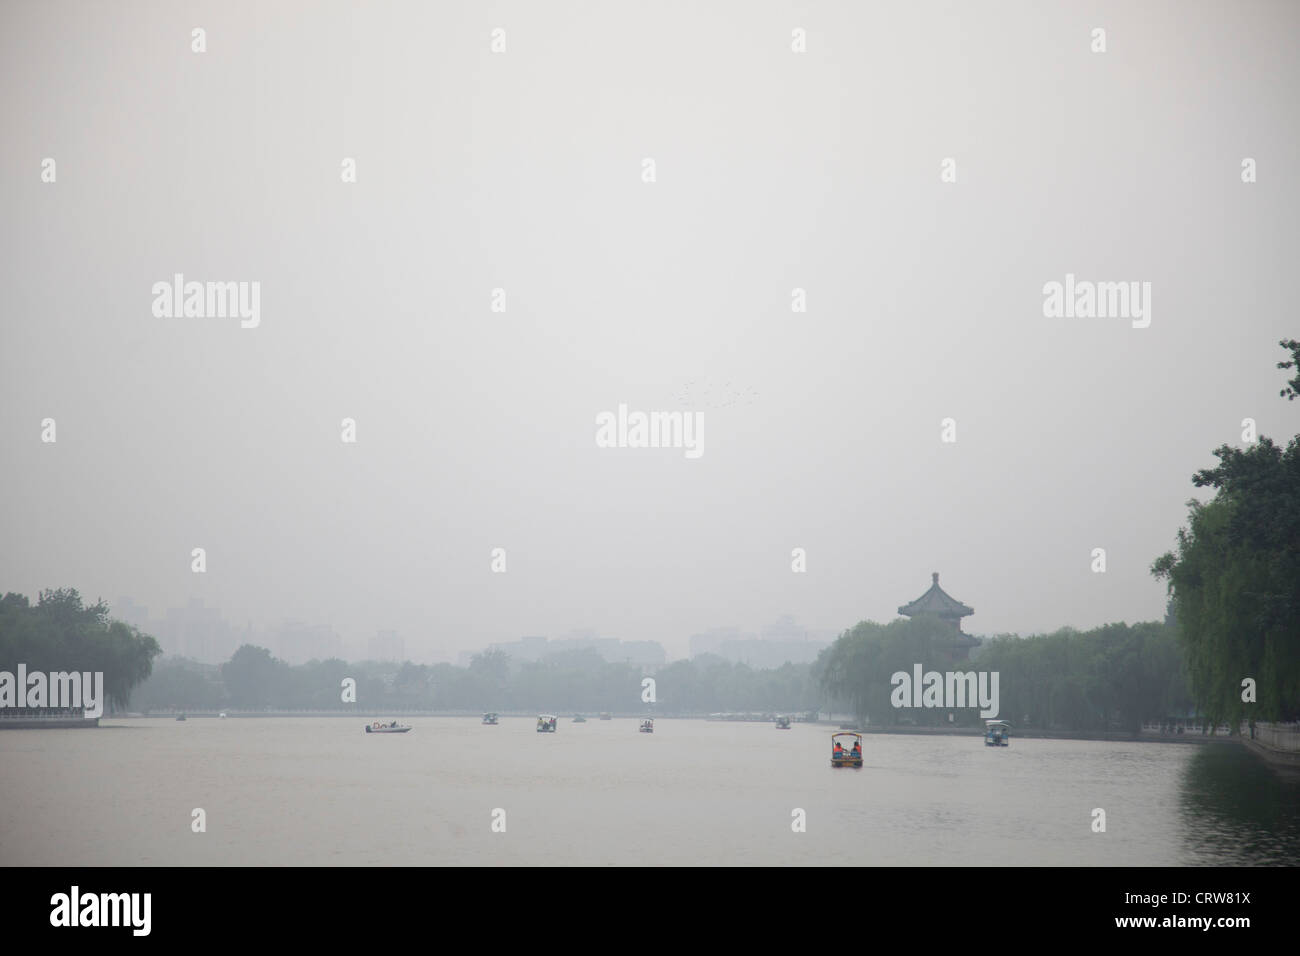 Shichahai lake at sunset, Beijing, China. - Stock Image